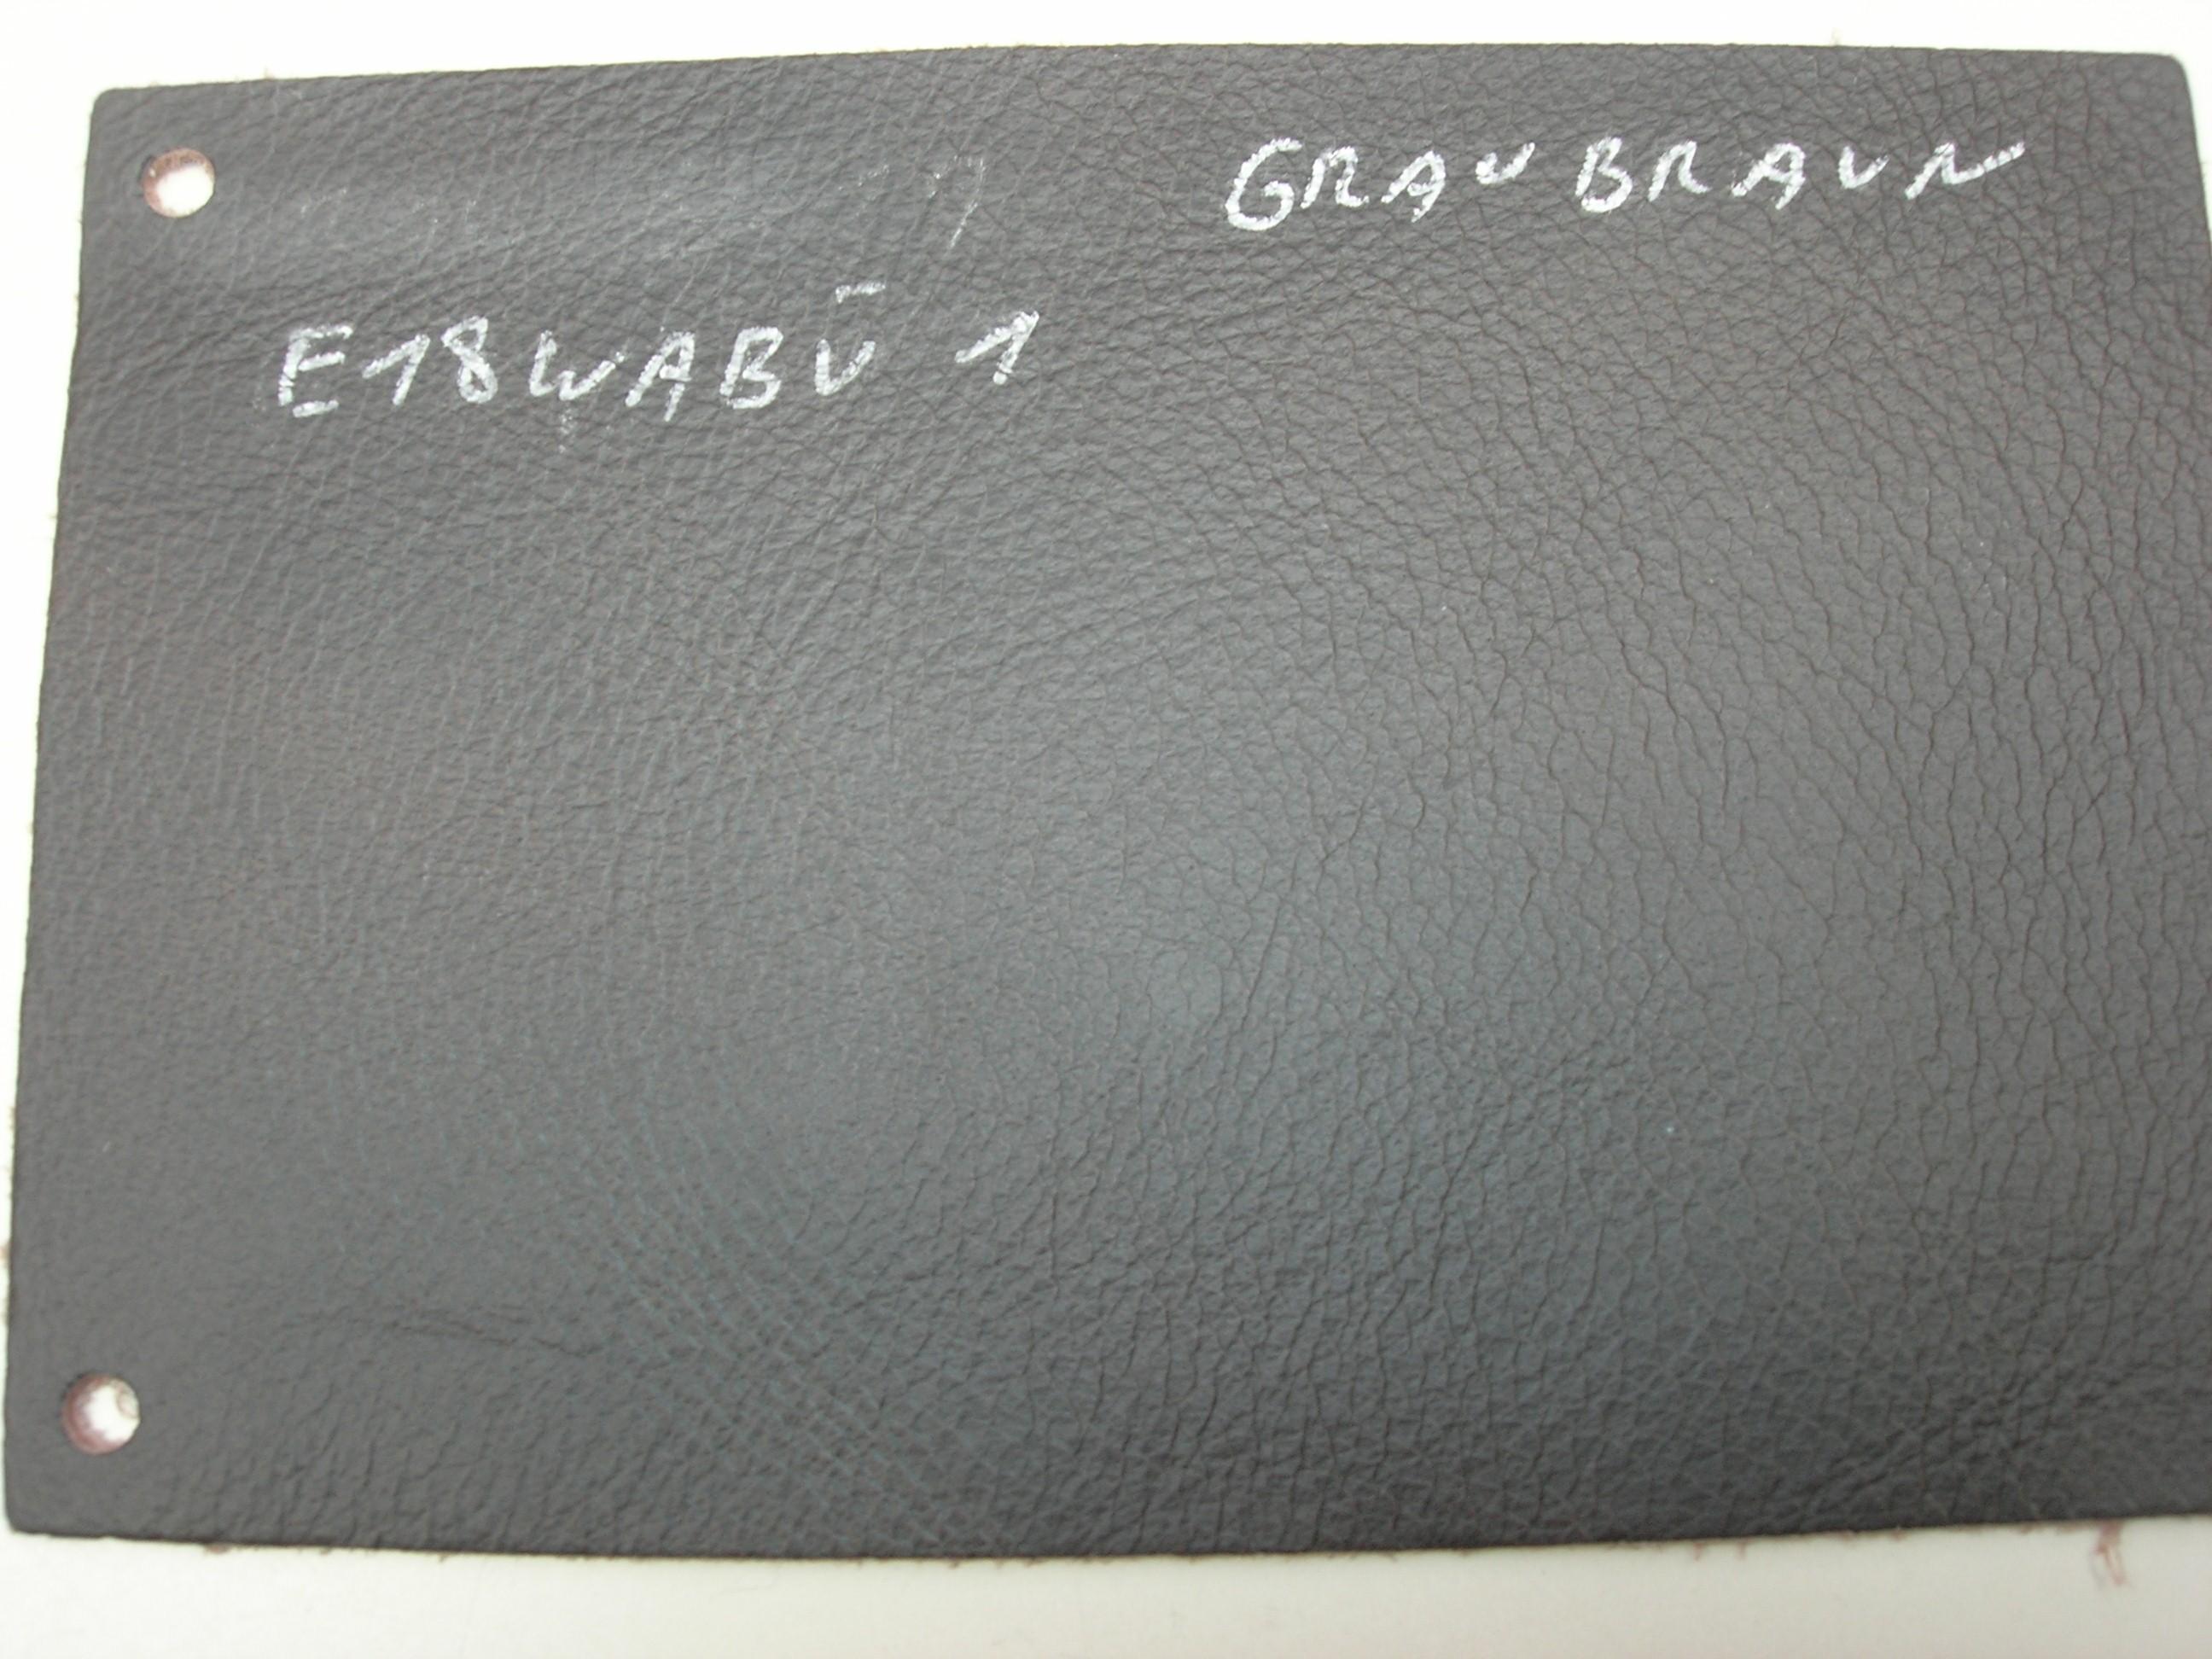 Wasserbüffel graubraun (E18WABÜ1)  Bestellware.